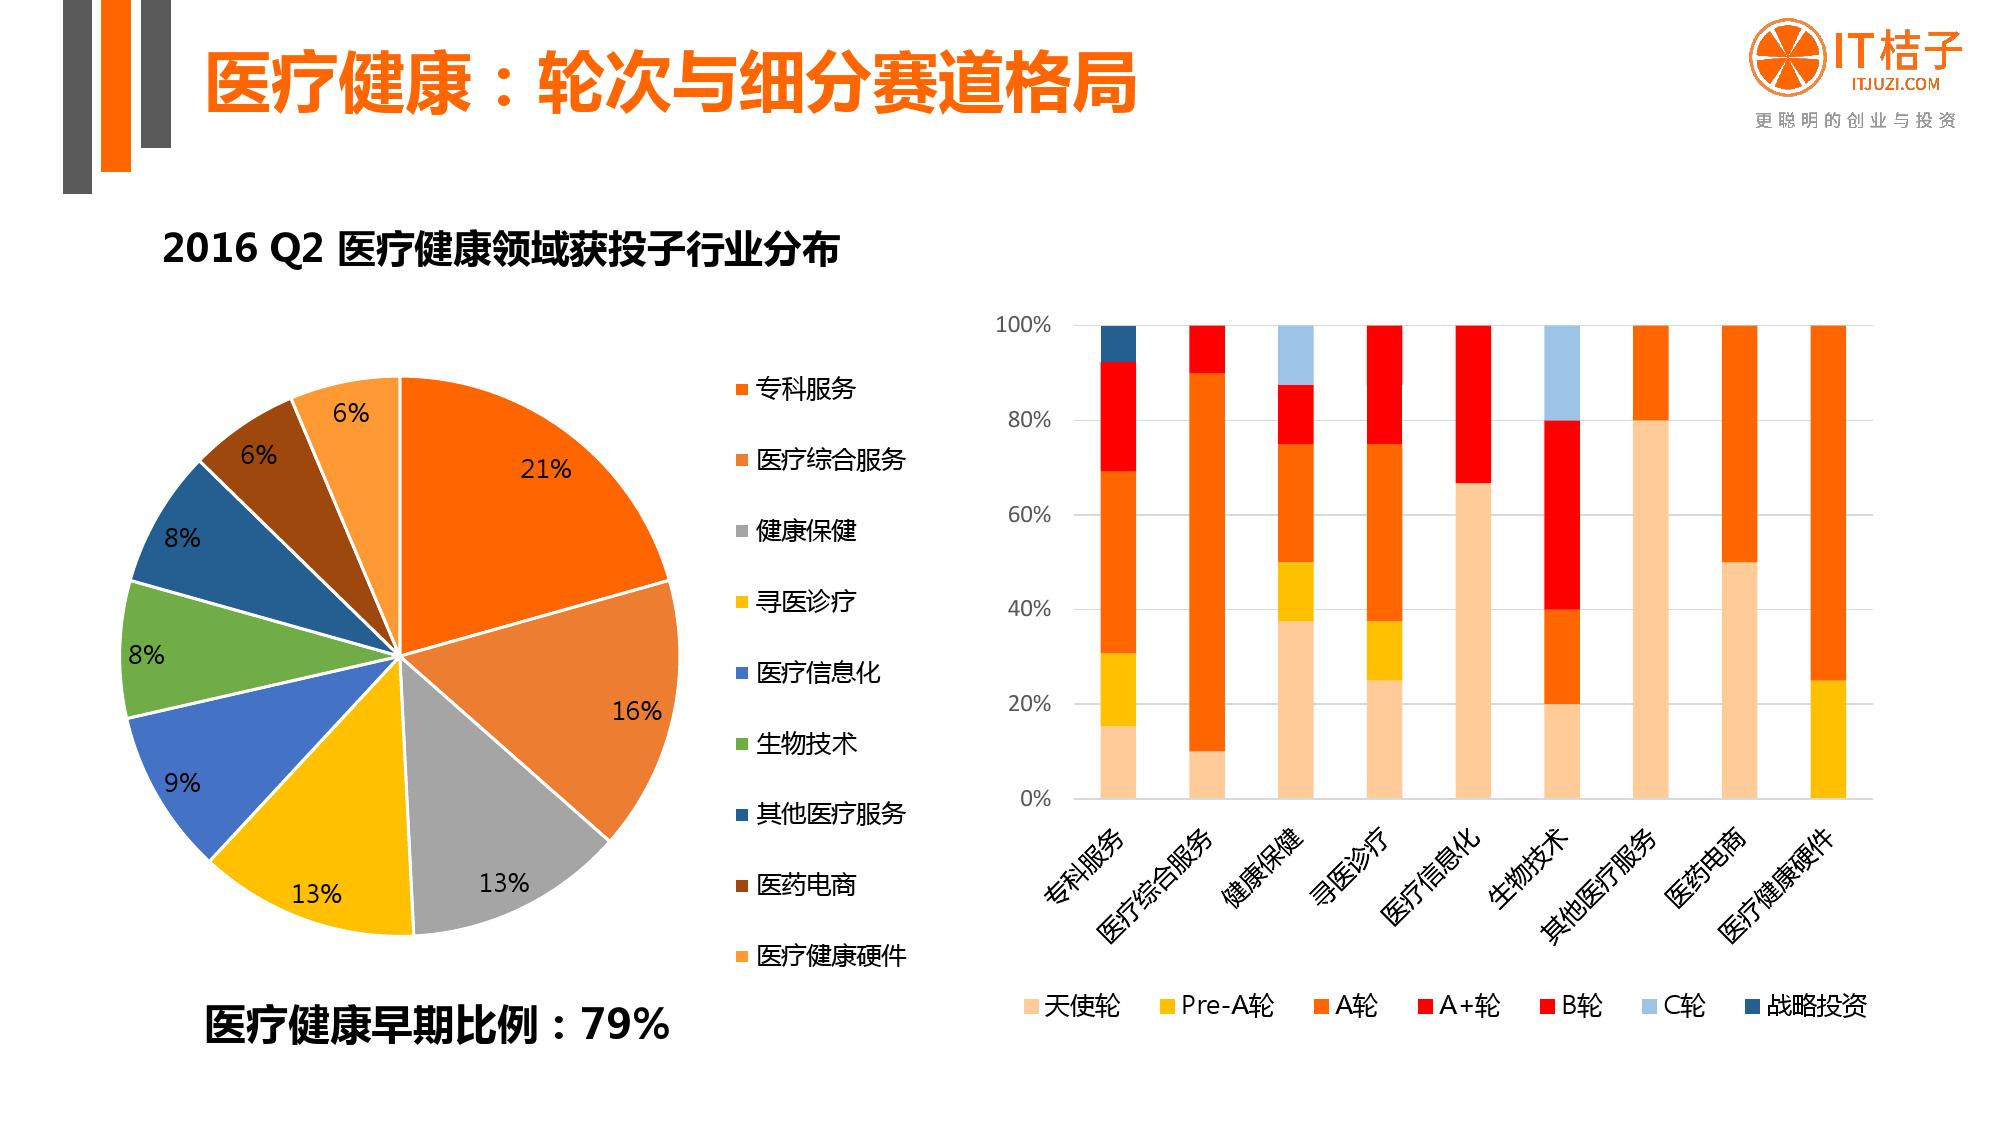 【IT桔子】2016年Q2中国互联网创业投资分析报告_000045